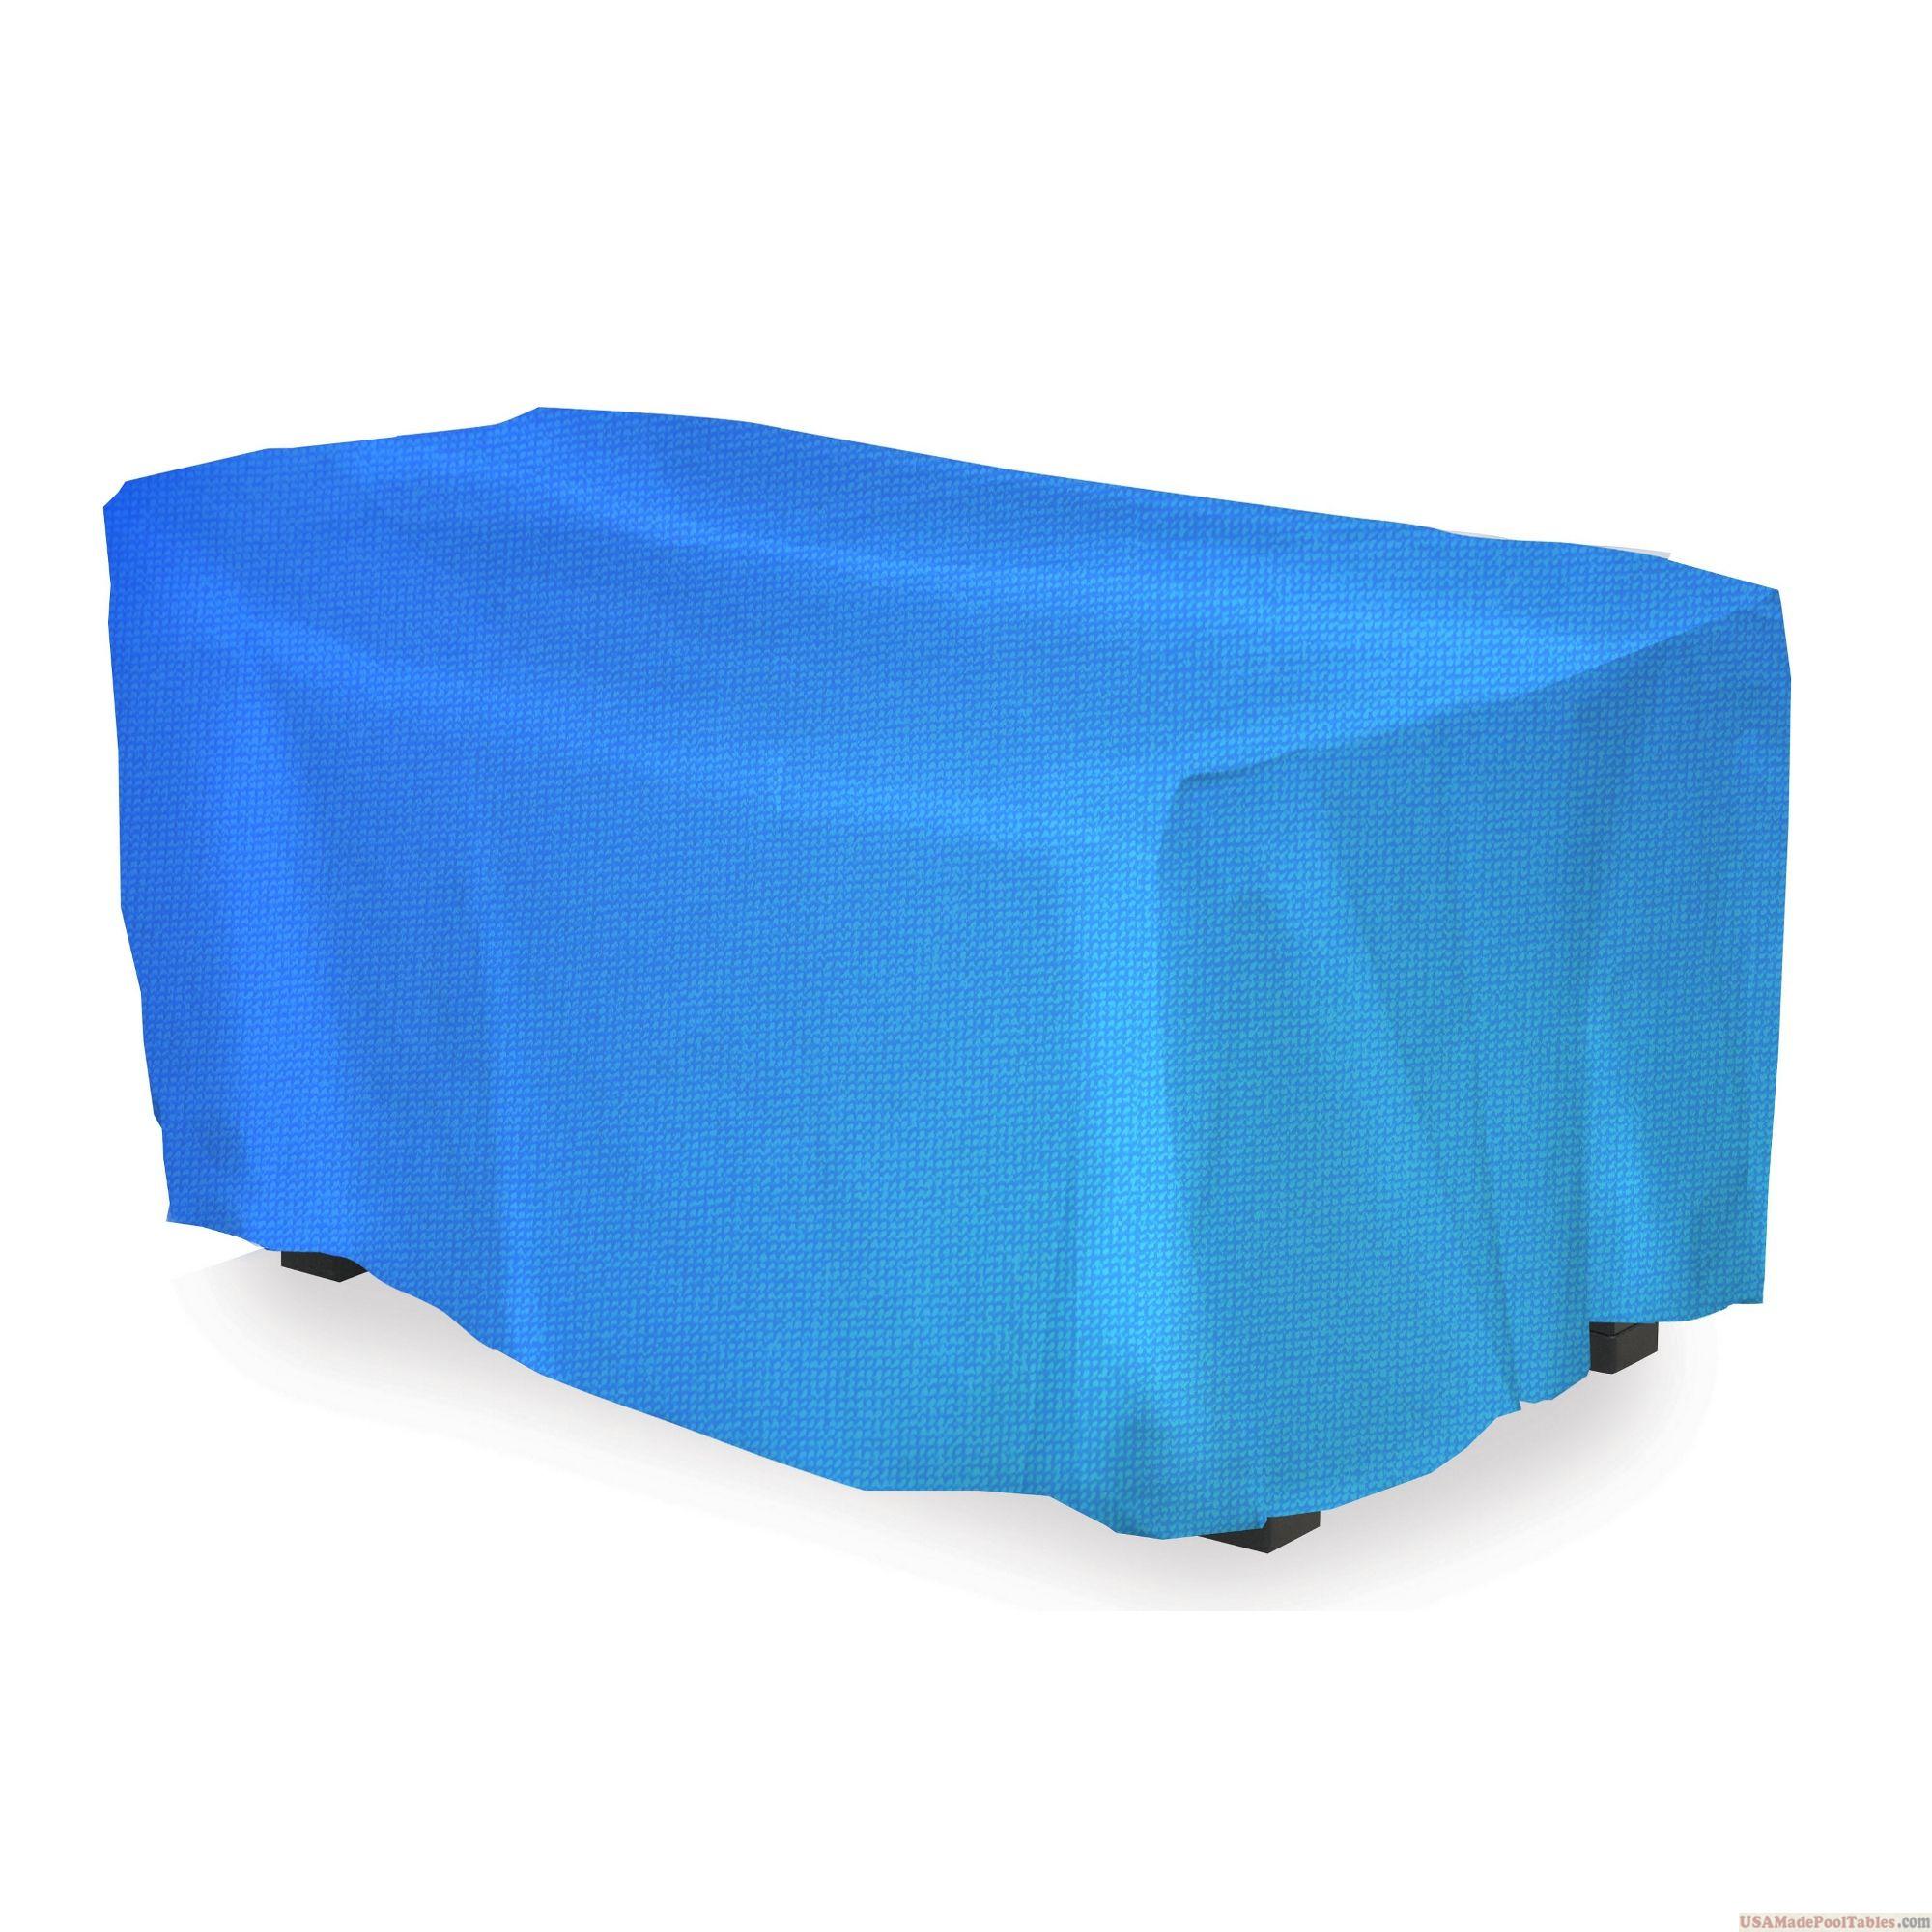 Foosball Soccer Table Cover Garlando